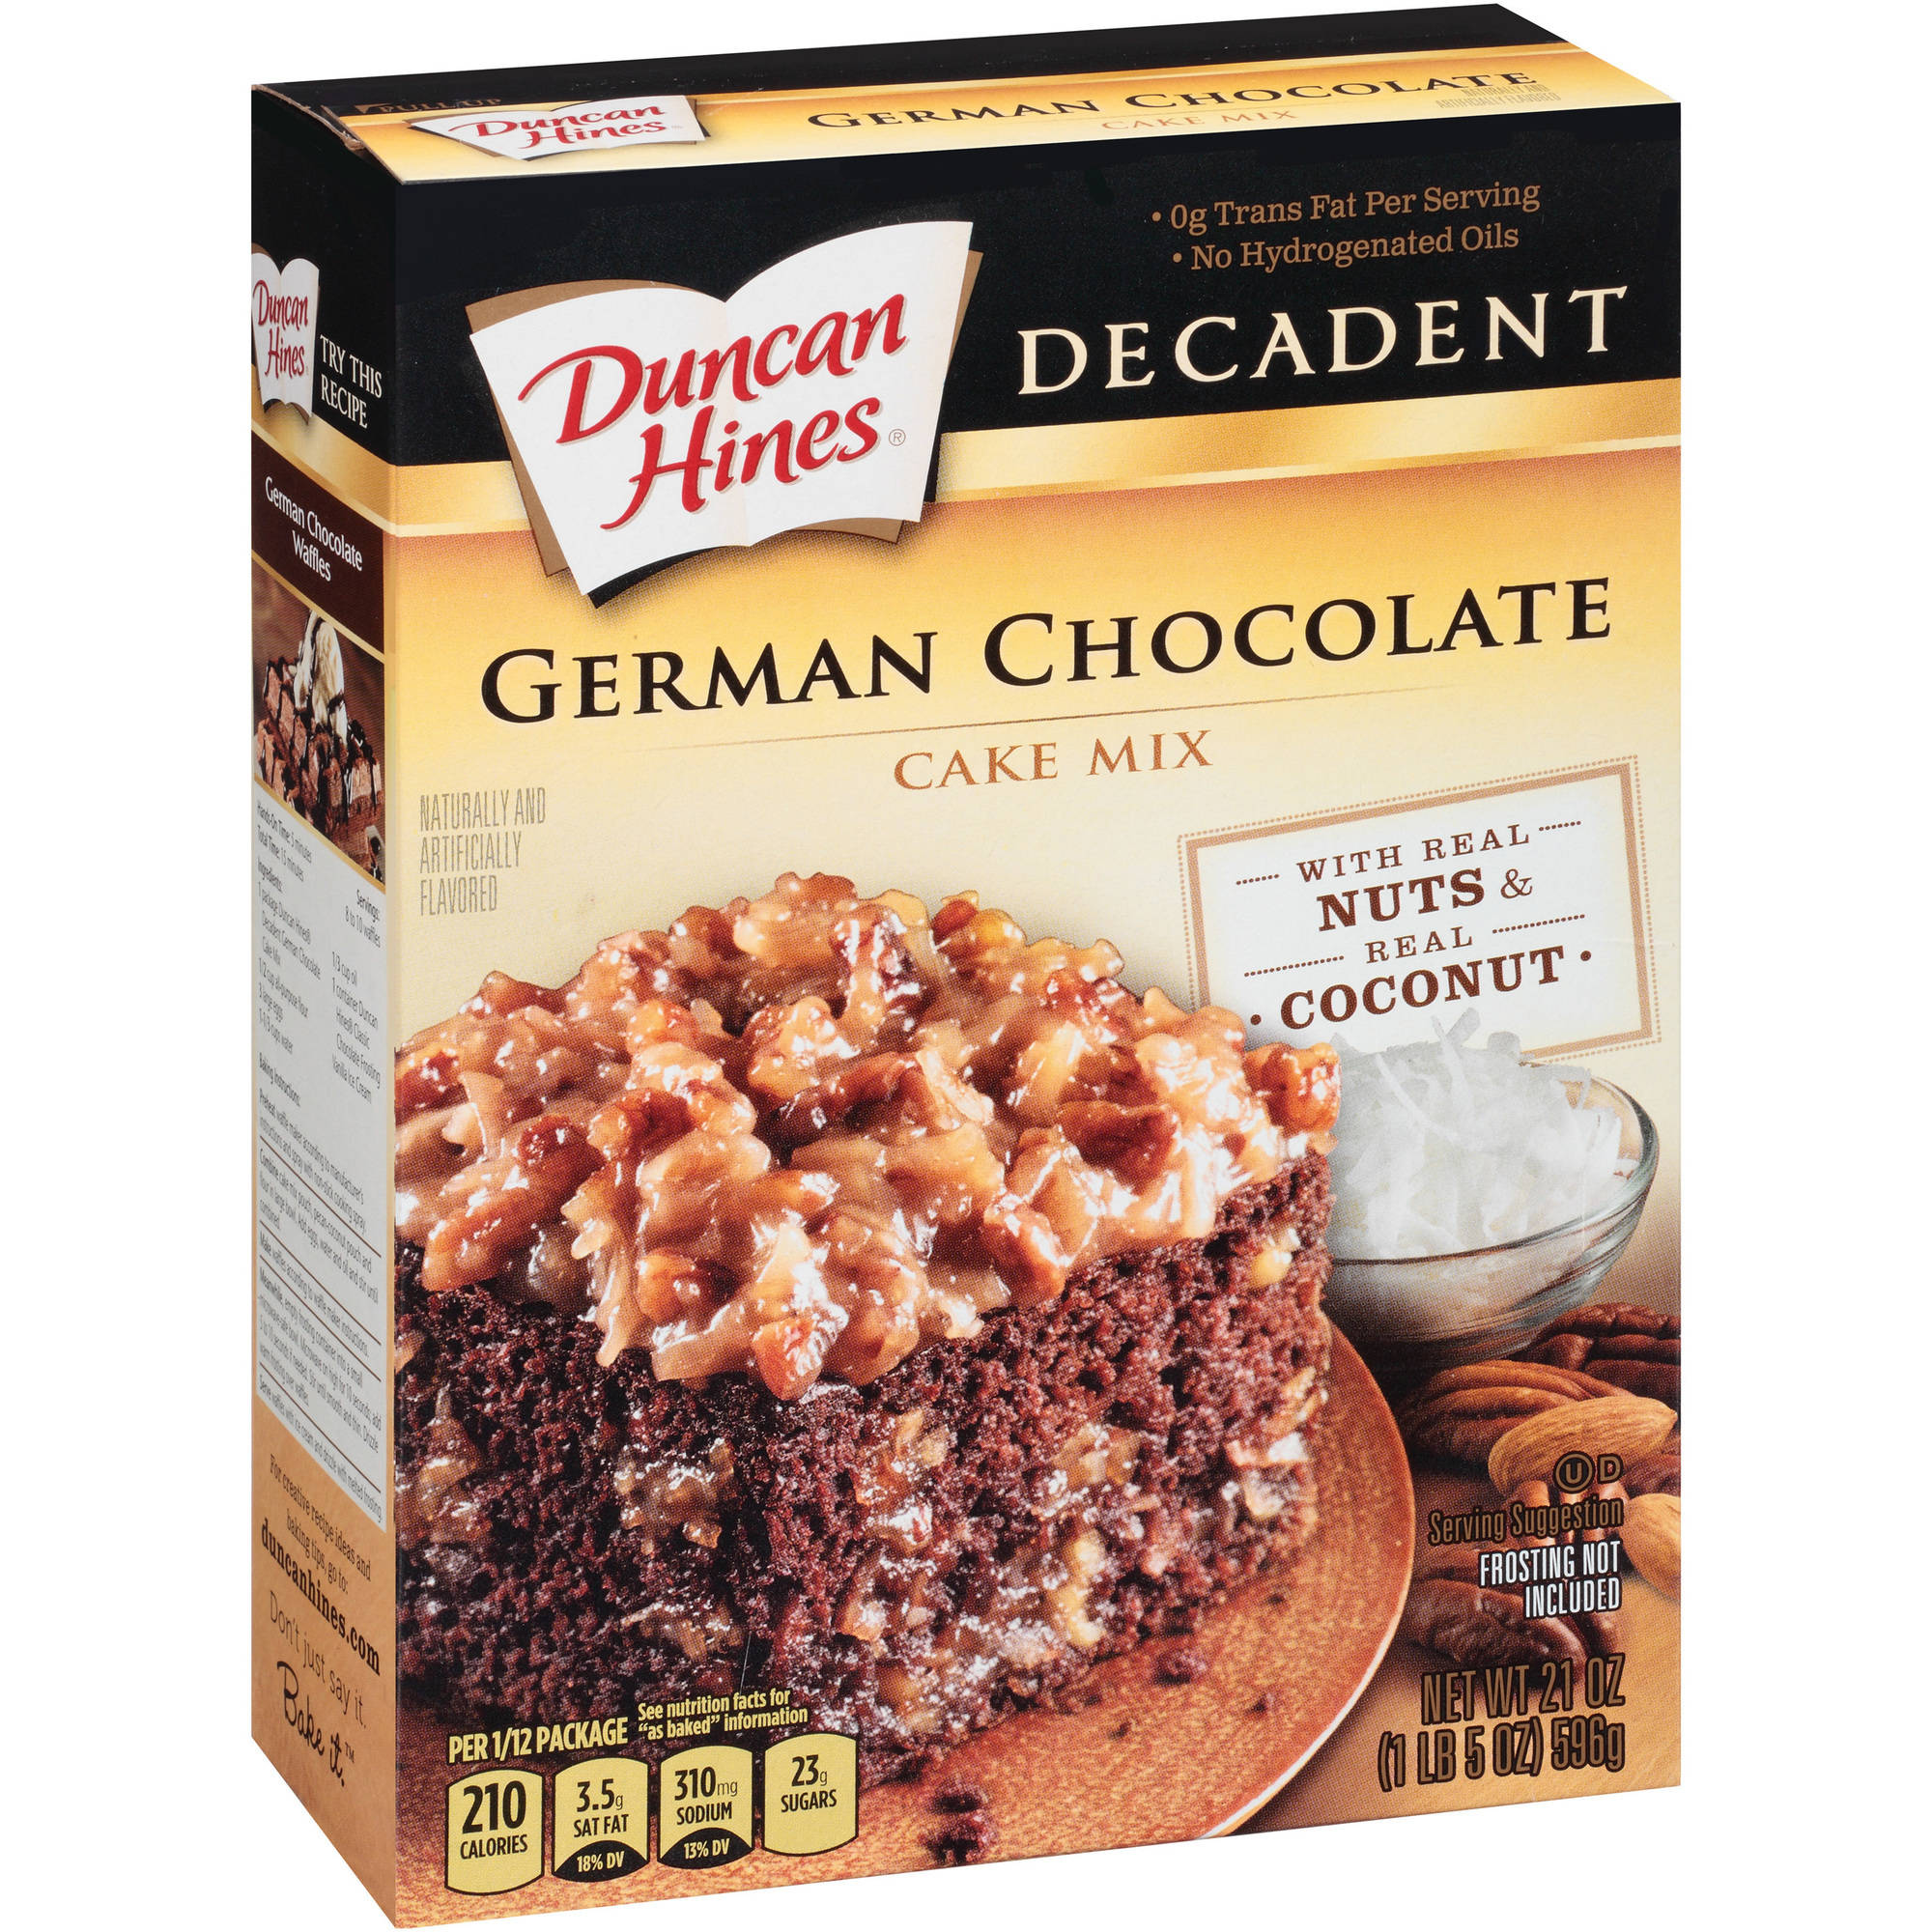 Duncan Hines Decadent German Chocolate Cake Mix, 21 oz